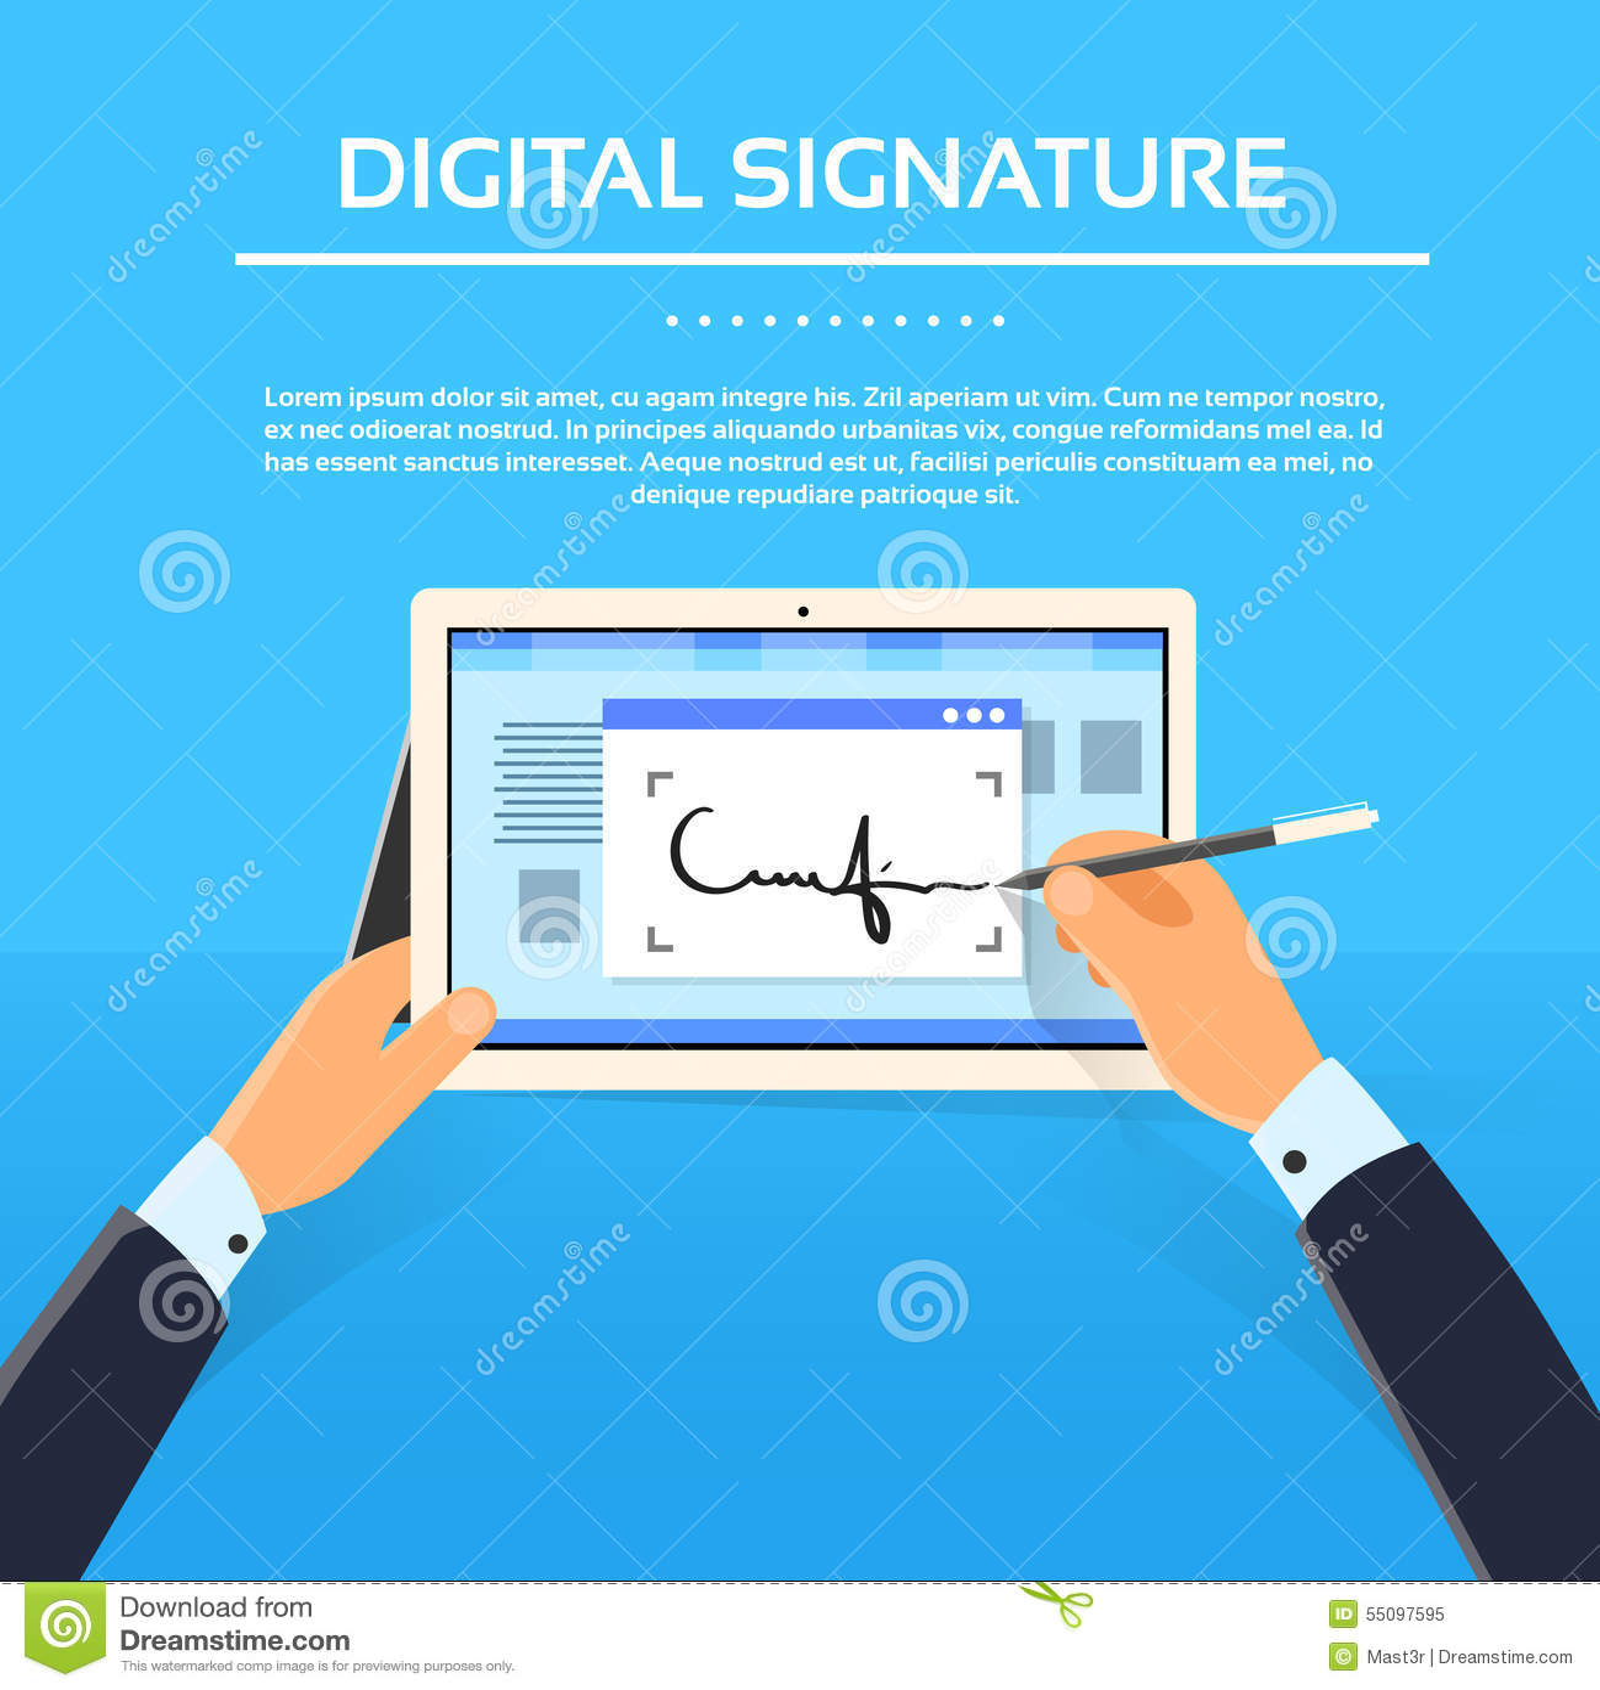 how to set up a digital signature